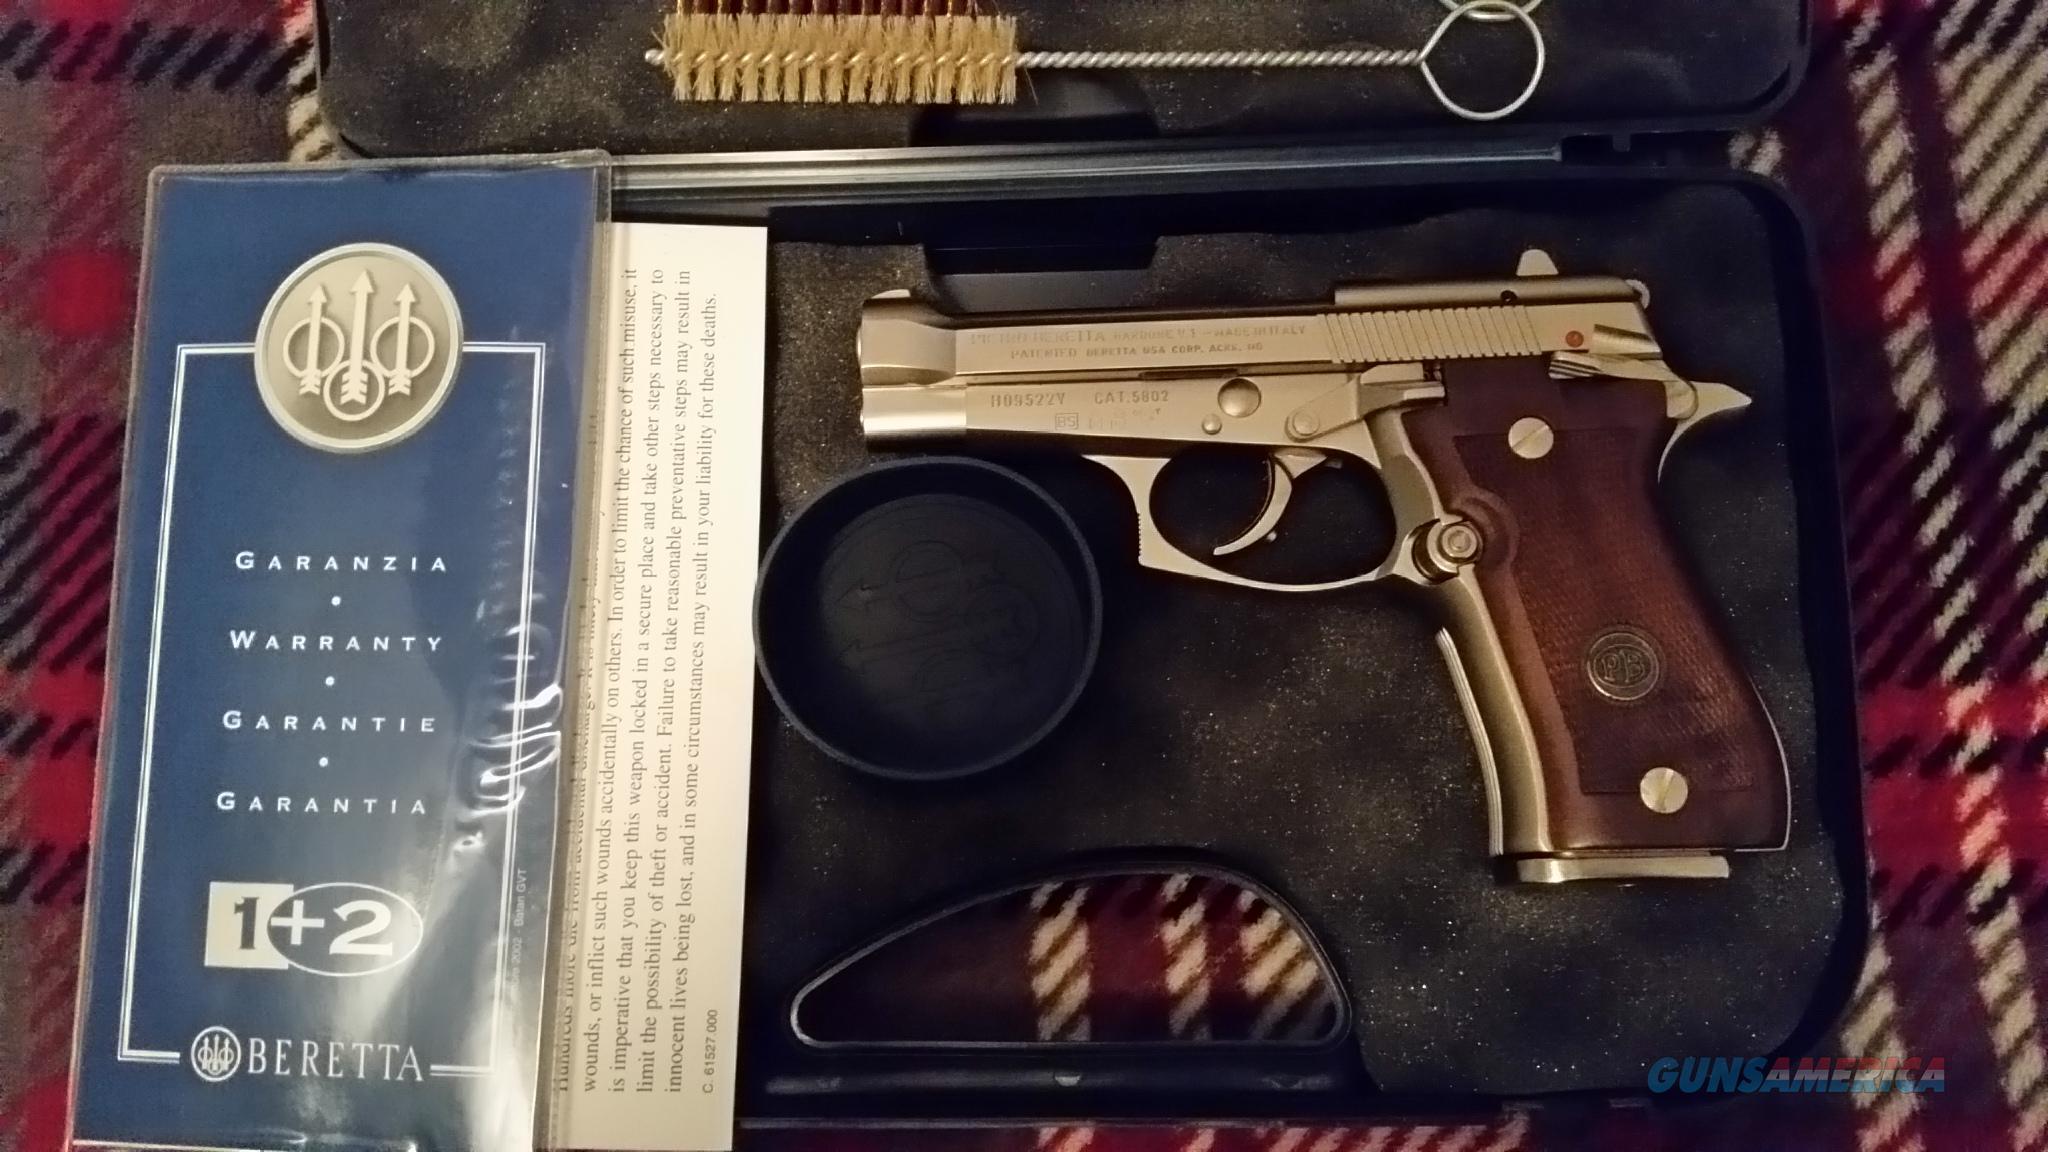 new in box unfired beretta 84fs nickel wood grips 2 13 Rd magazines